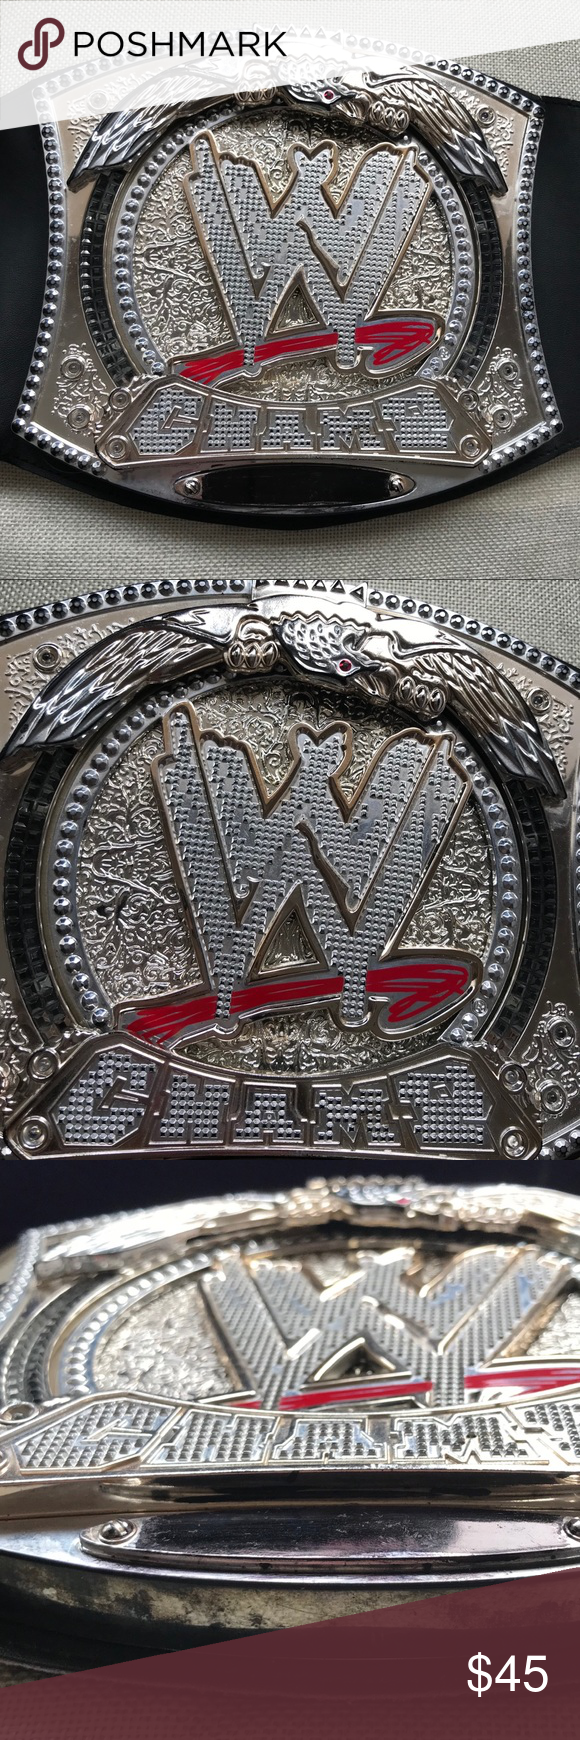 Wwe Championship Belt 2010 John Censa 38 Belt Wwe John Cena 2010 38 Spinner Belt Rare Tested Bat Wwe Championship Belts Accessories Italian Charm Bracelet